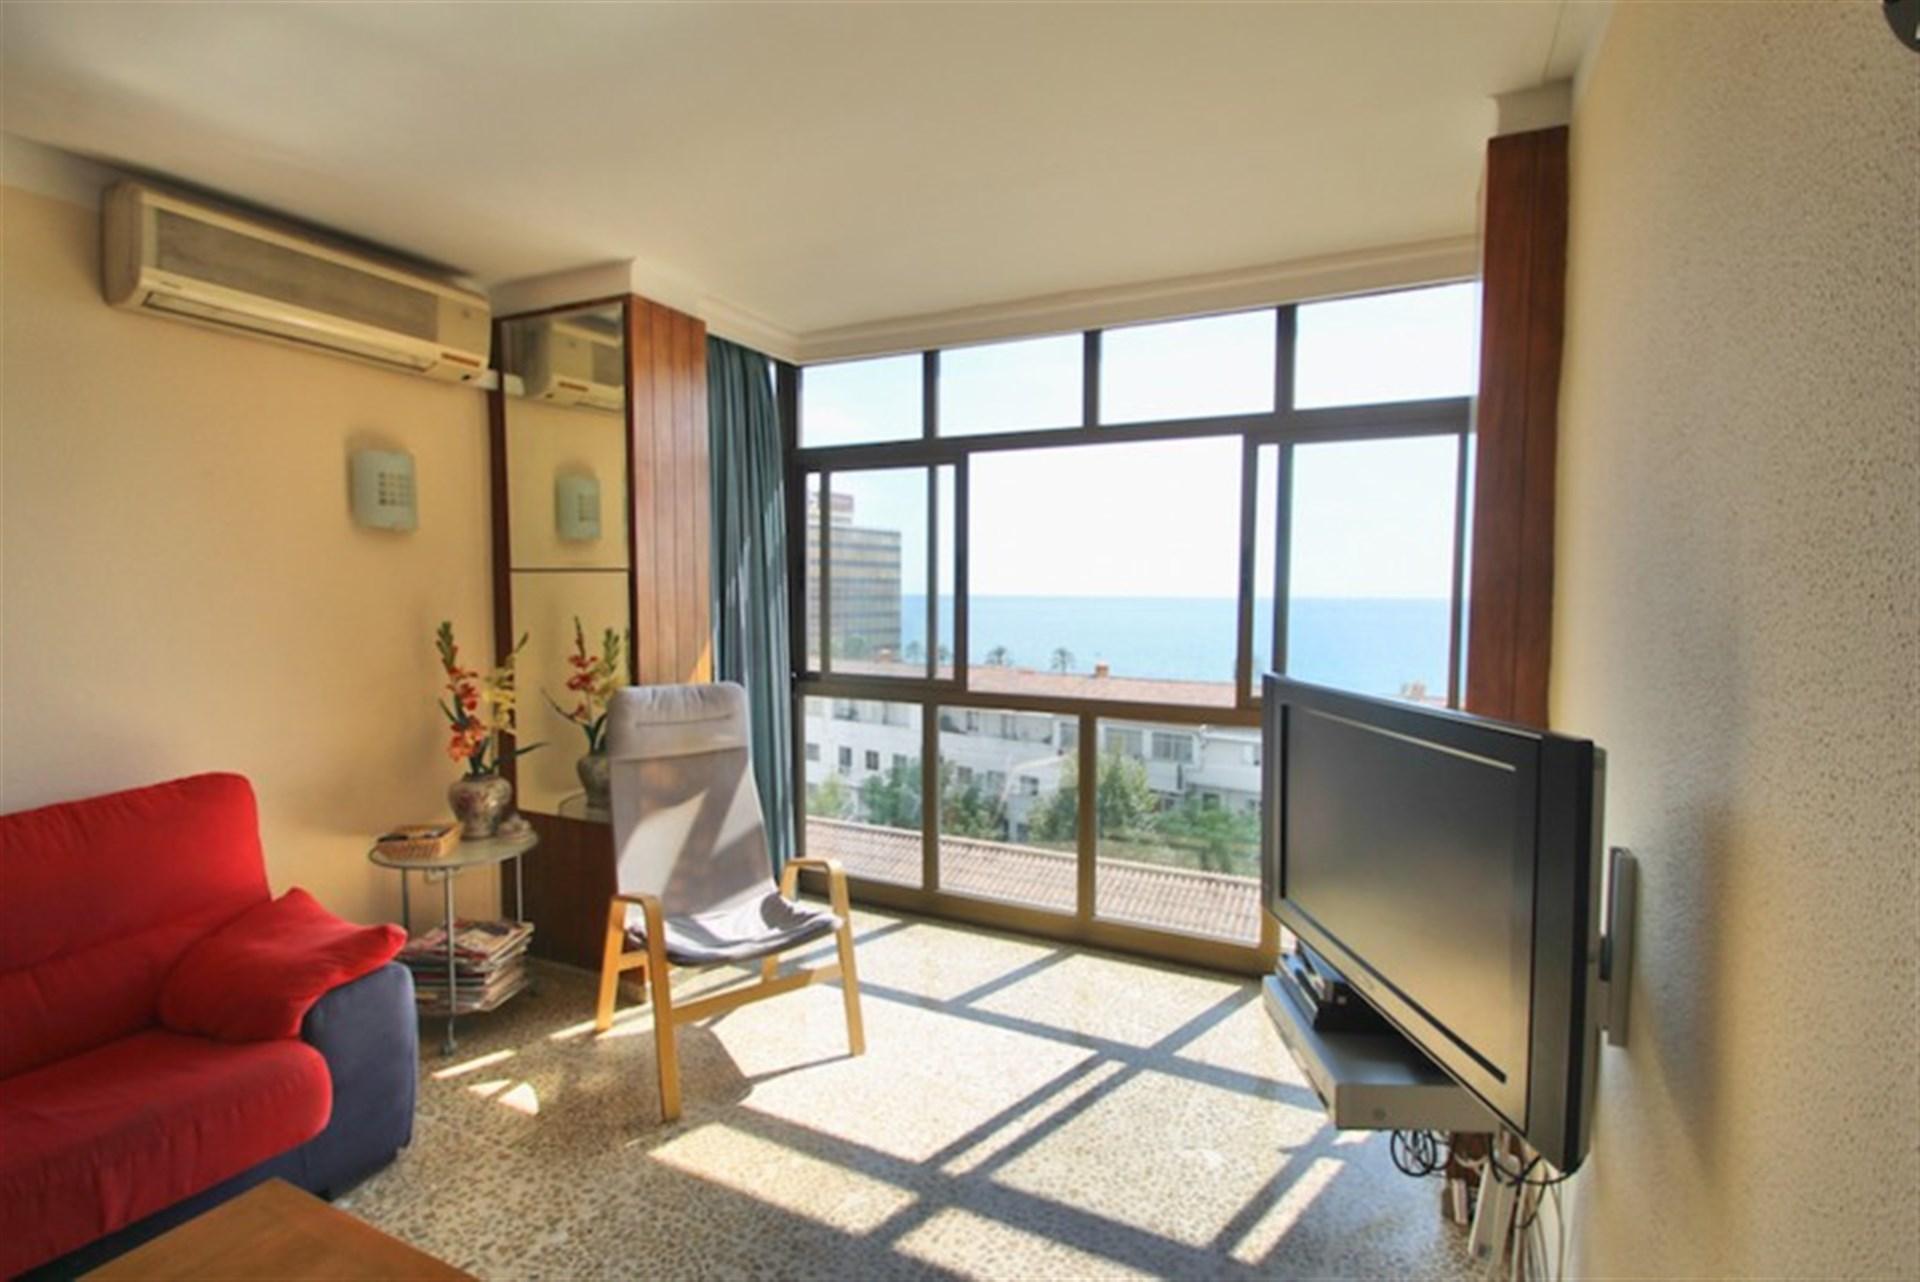 Vardagsrum med fin havsutsikt